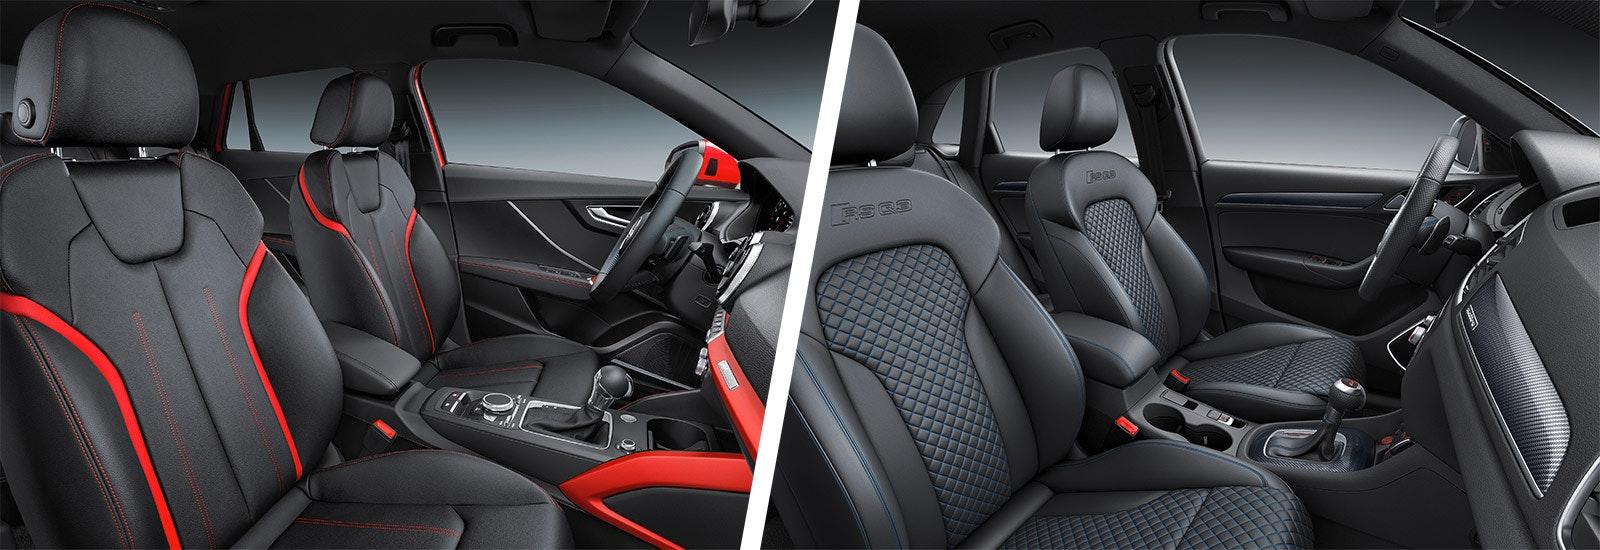 Audi Q2 Vs Q3 Suv Comparison Carwow